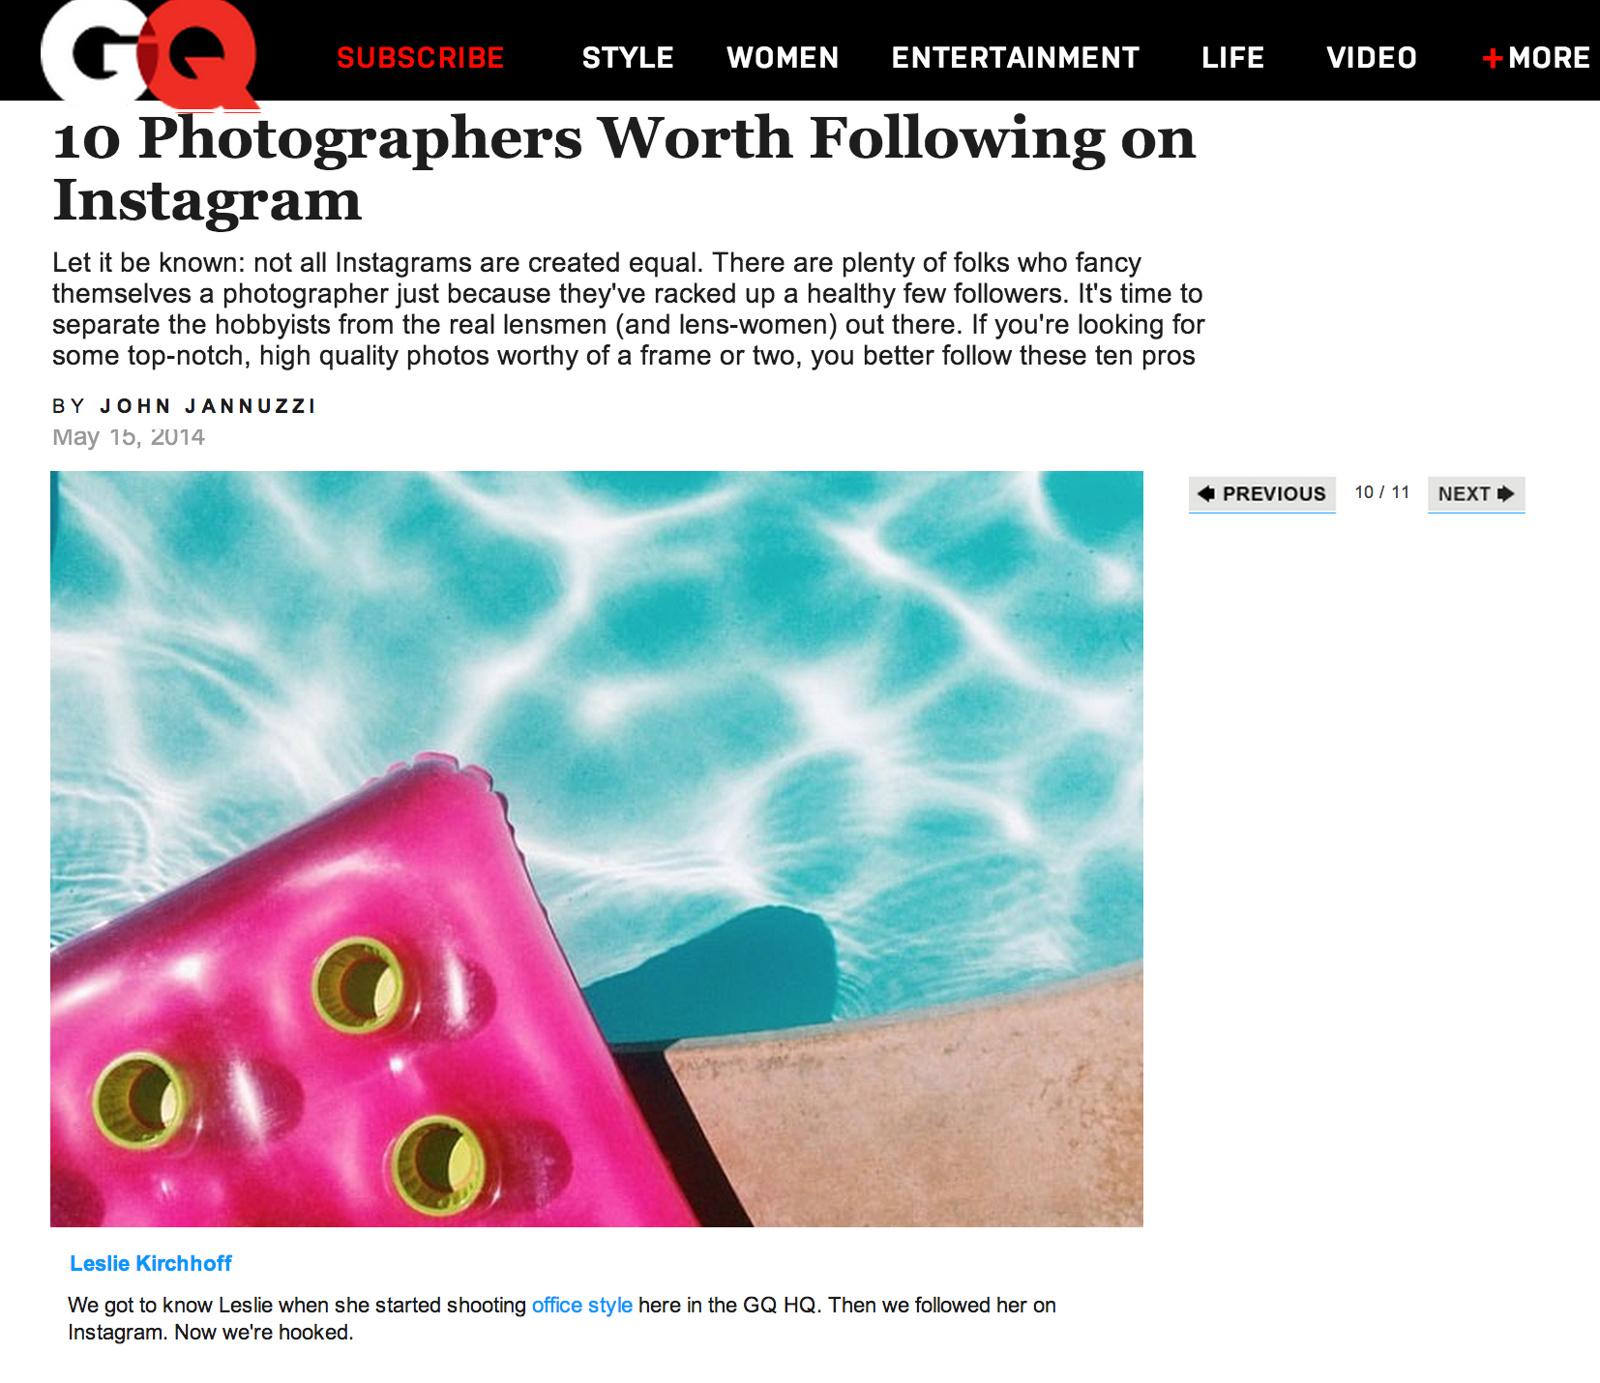 http://www.gq.com/style/201405/best-photographers-instagram#slide=10